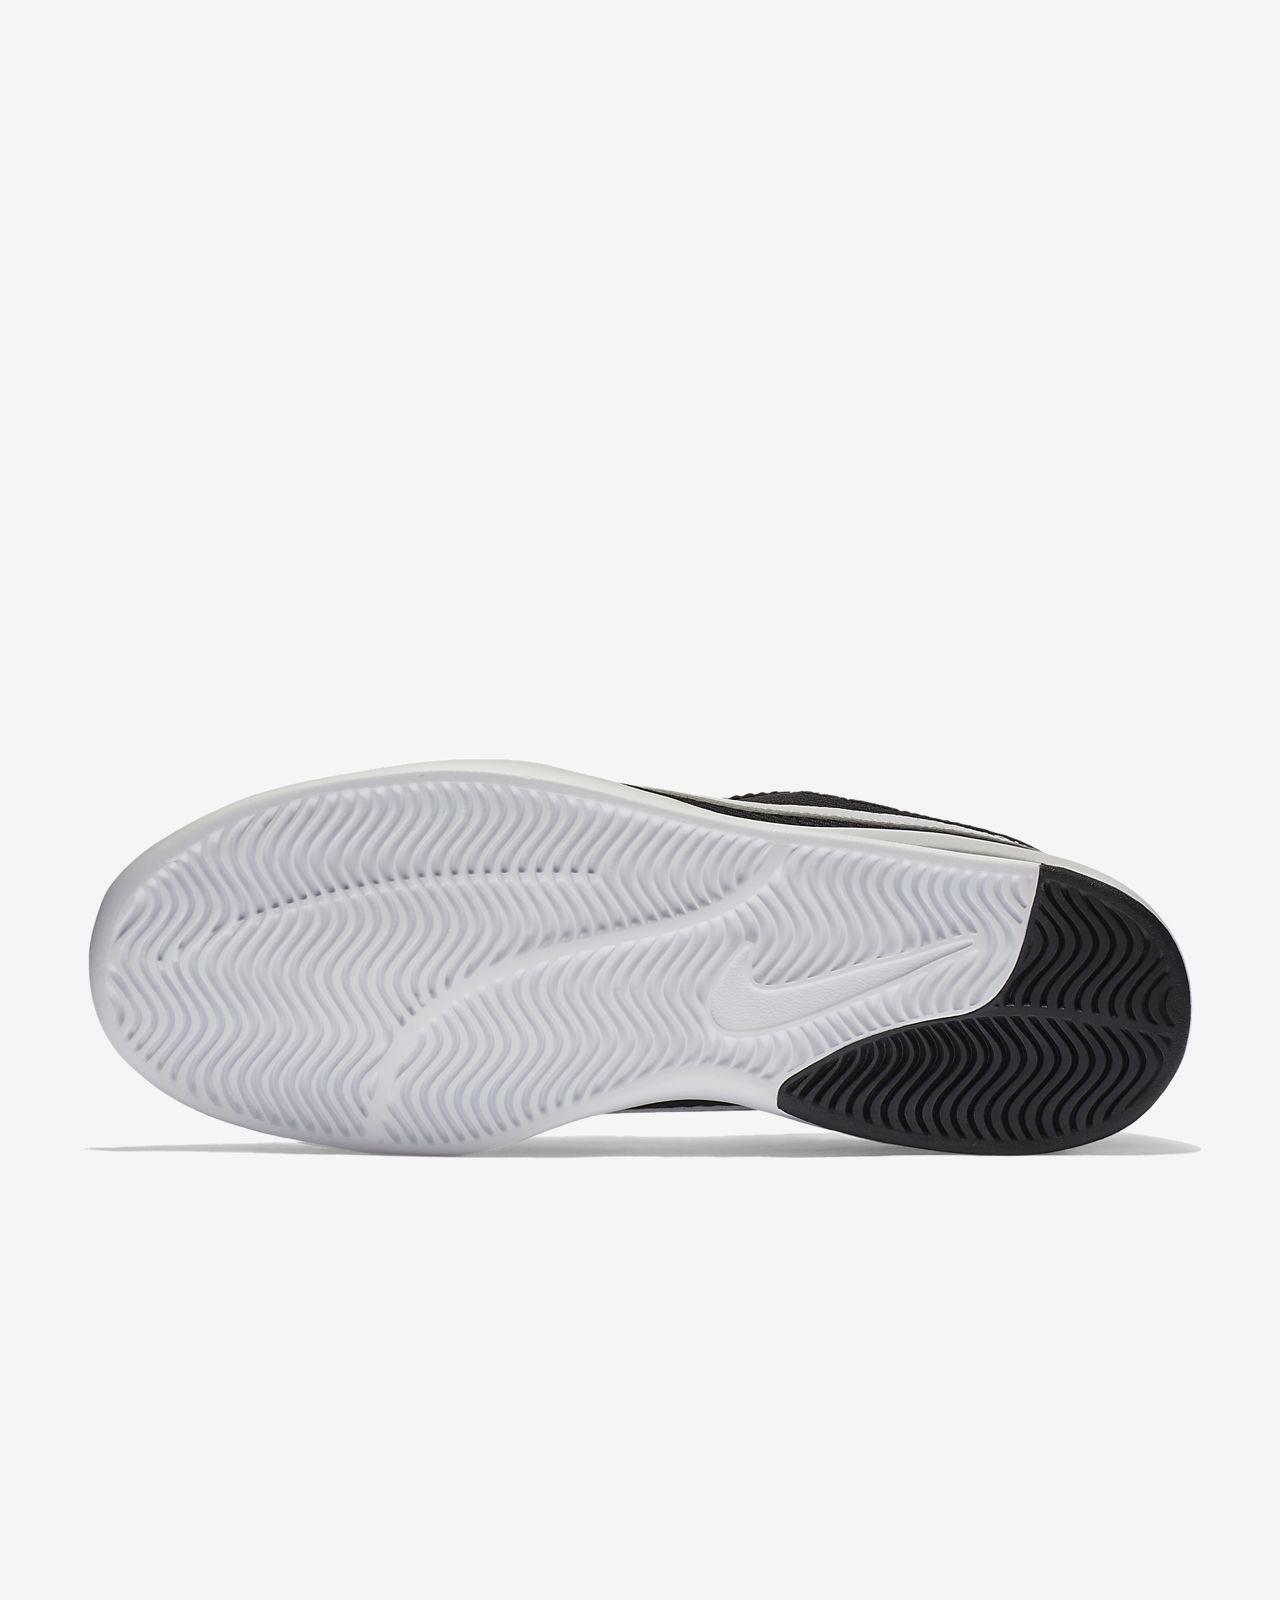 super popular aa706 2c8b1 Scarpa da skate Nike SB Air Max Bruin Vapor - Uomo. Nike.com IT